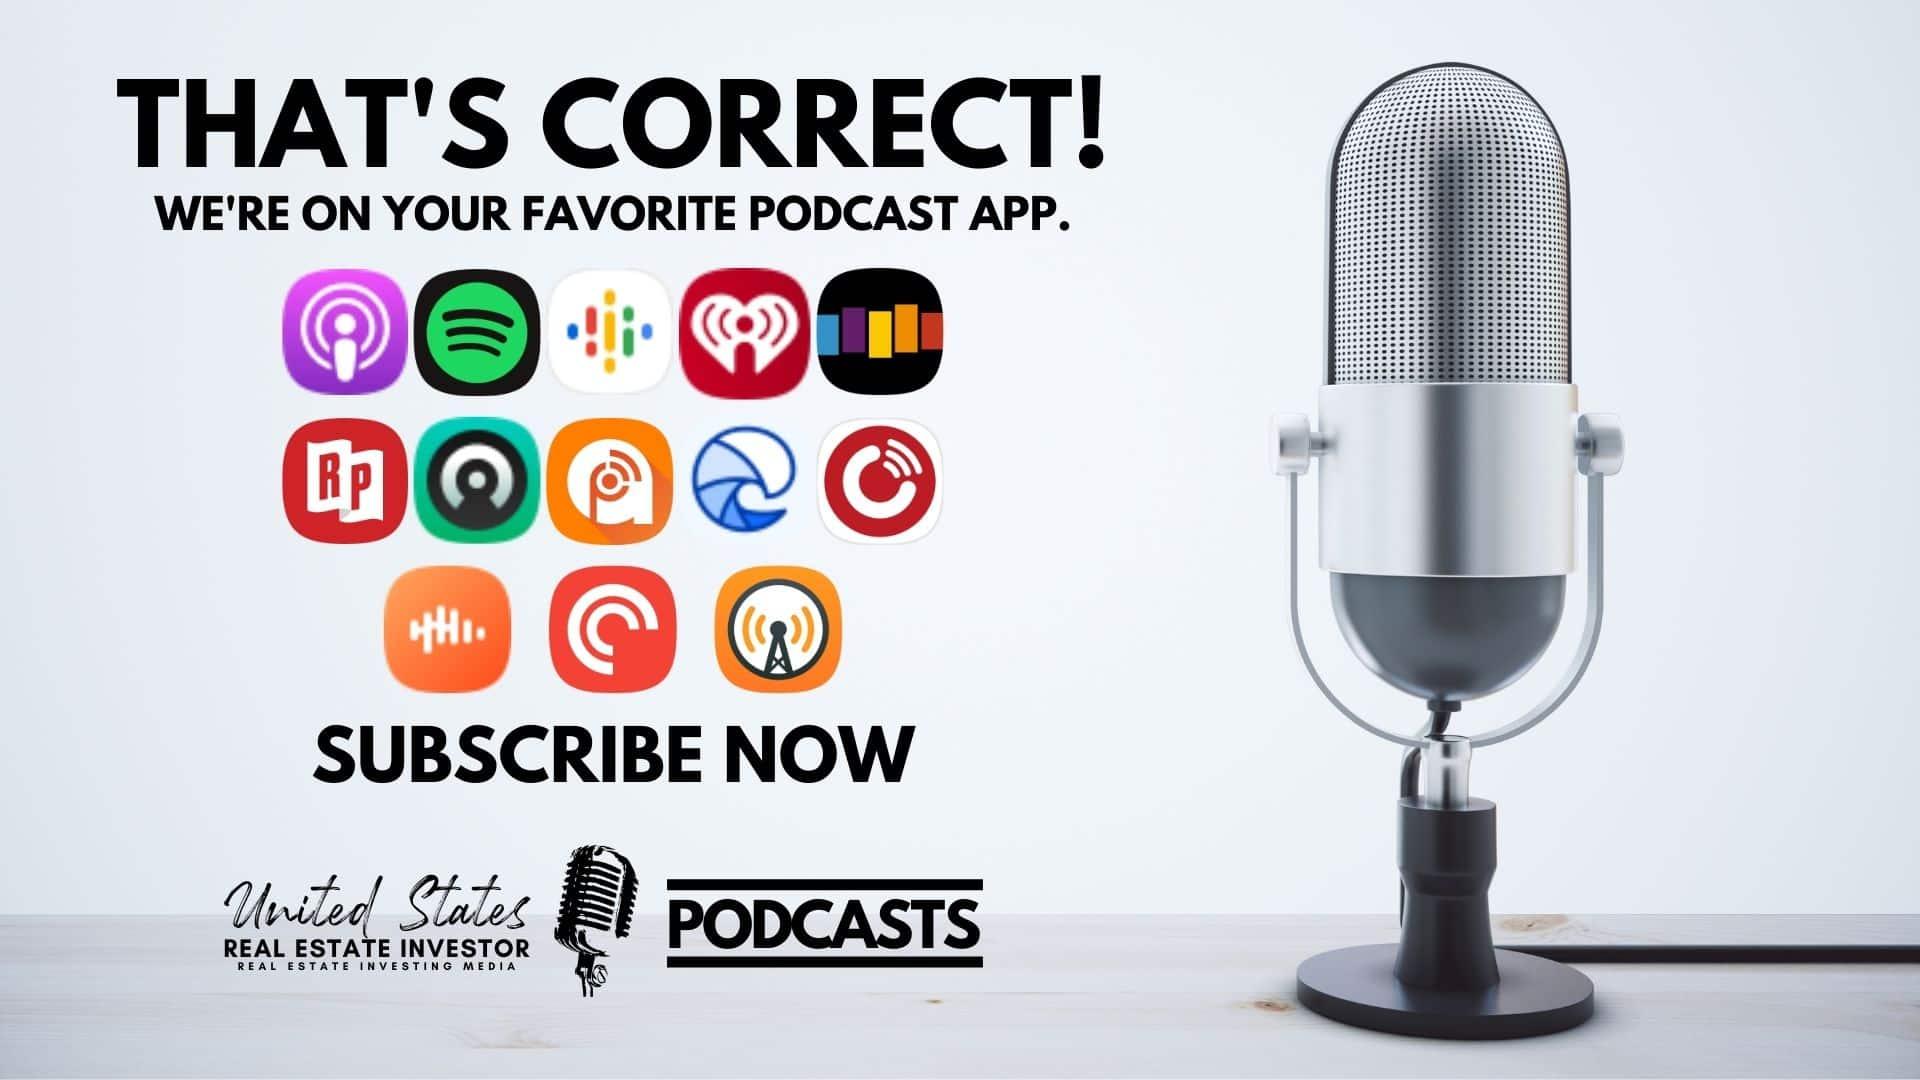 United States Real Estate Investor - Real estate investing media, We're On Your Favorite Podcast App